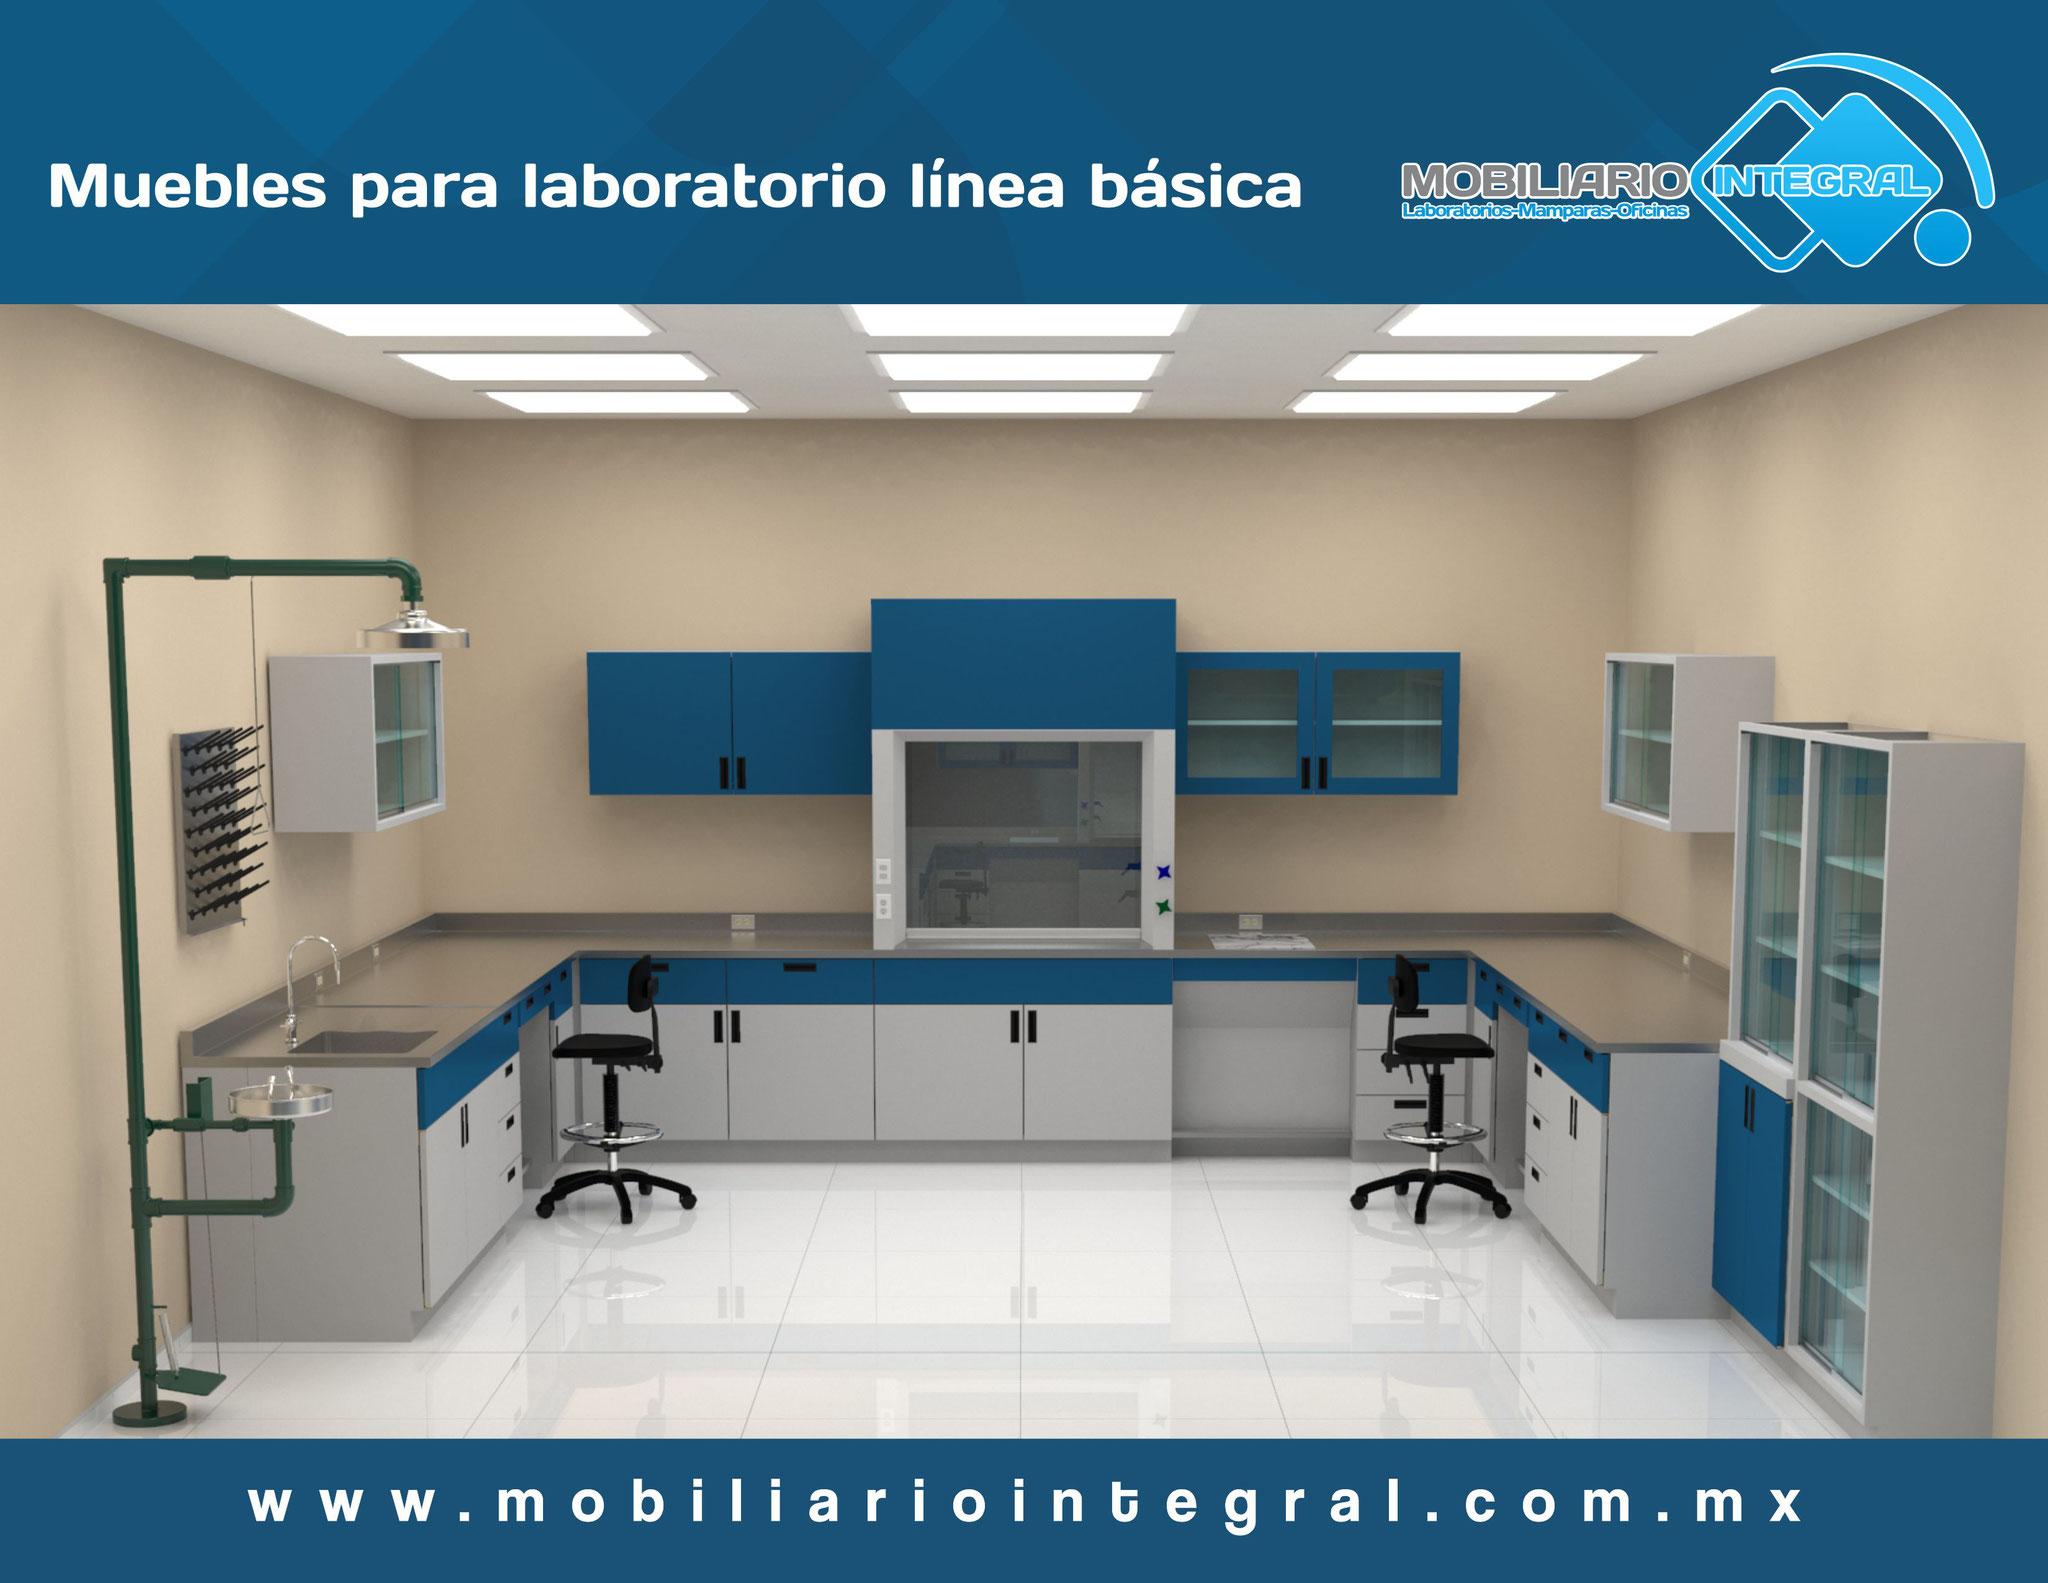 Muebles para laboratorio en Irapuato